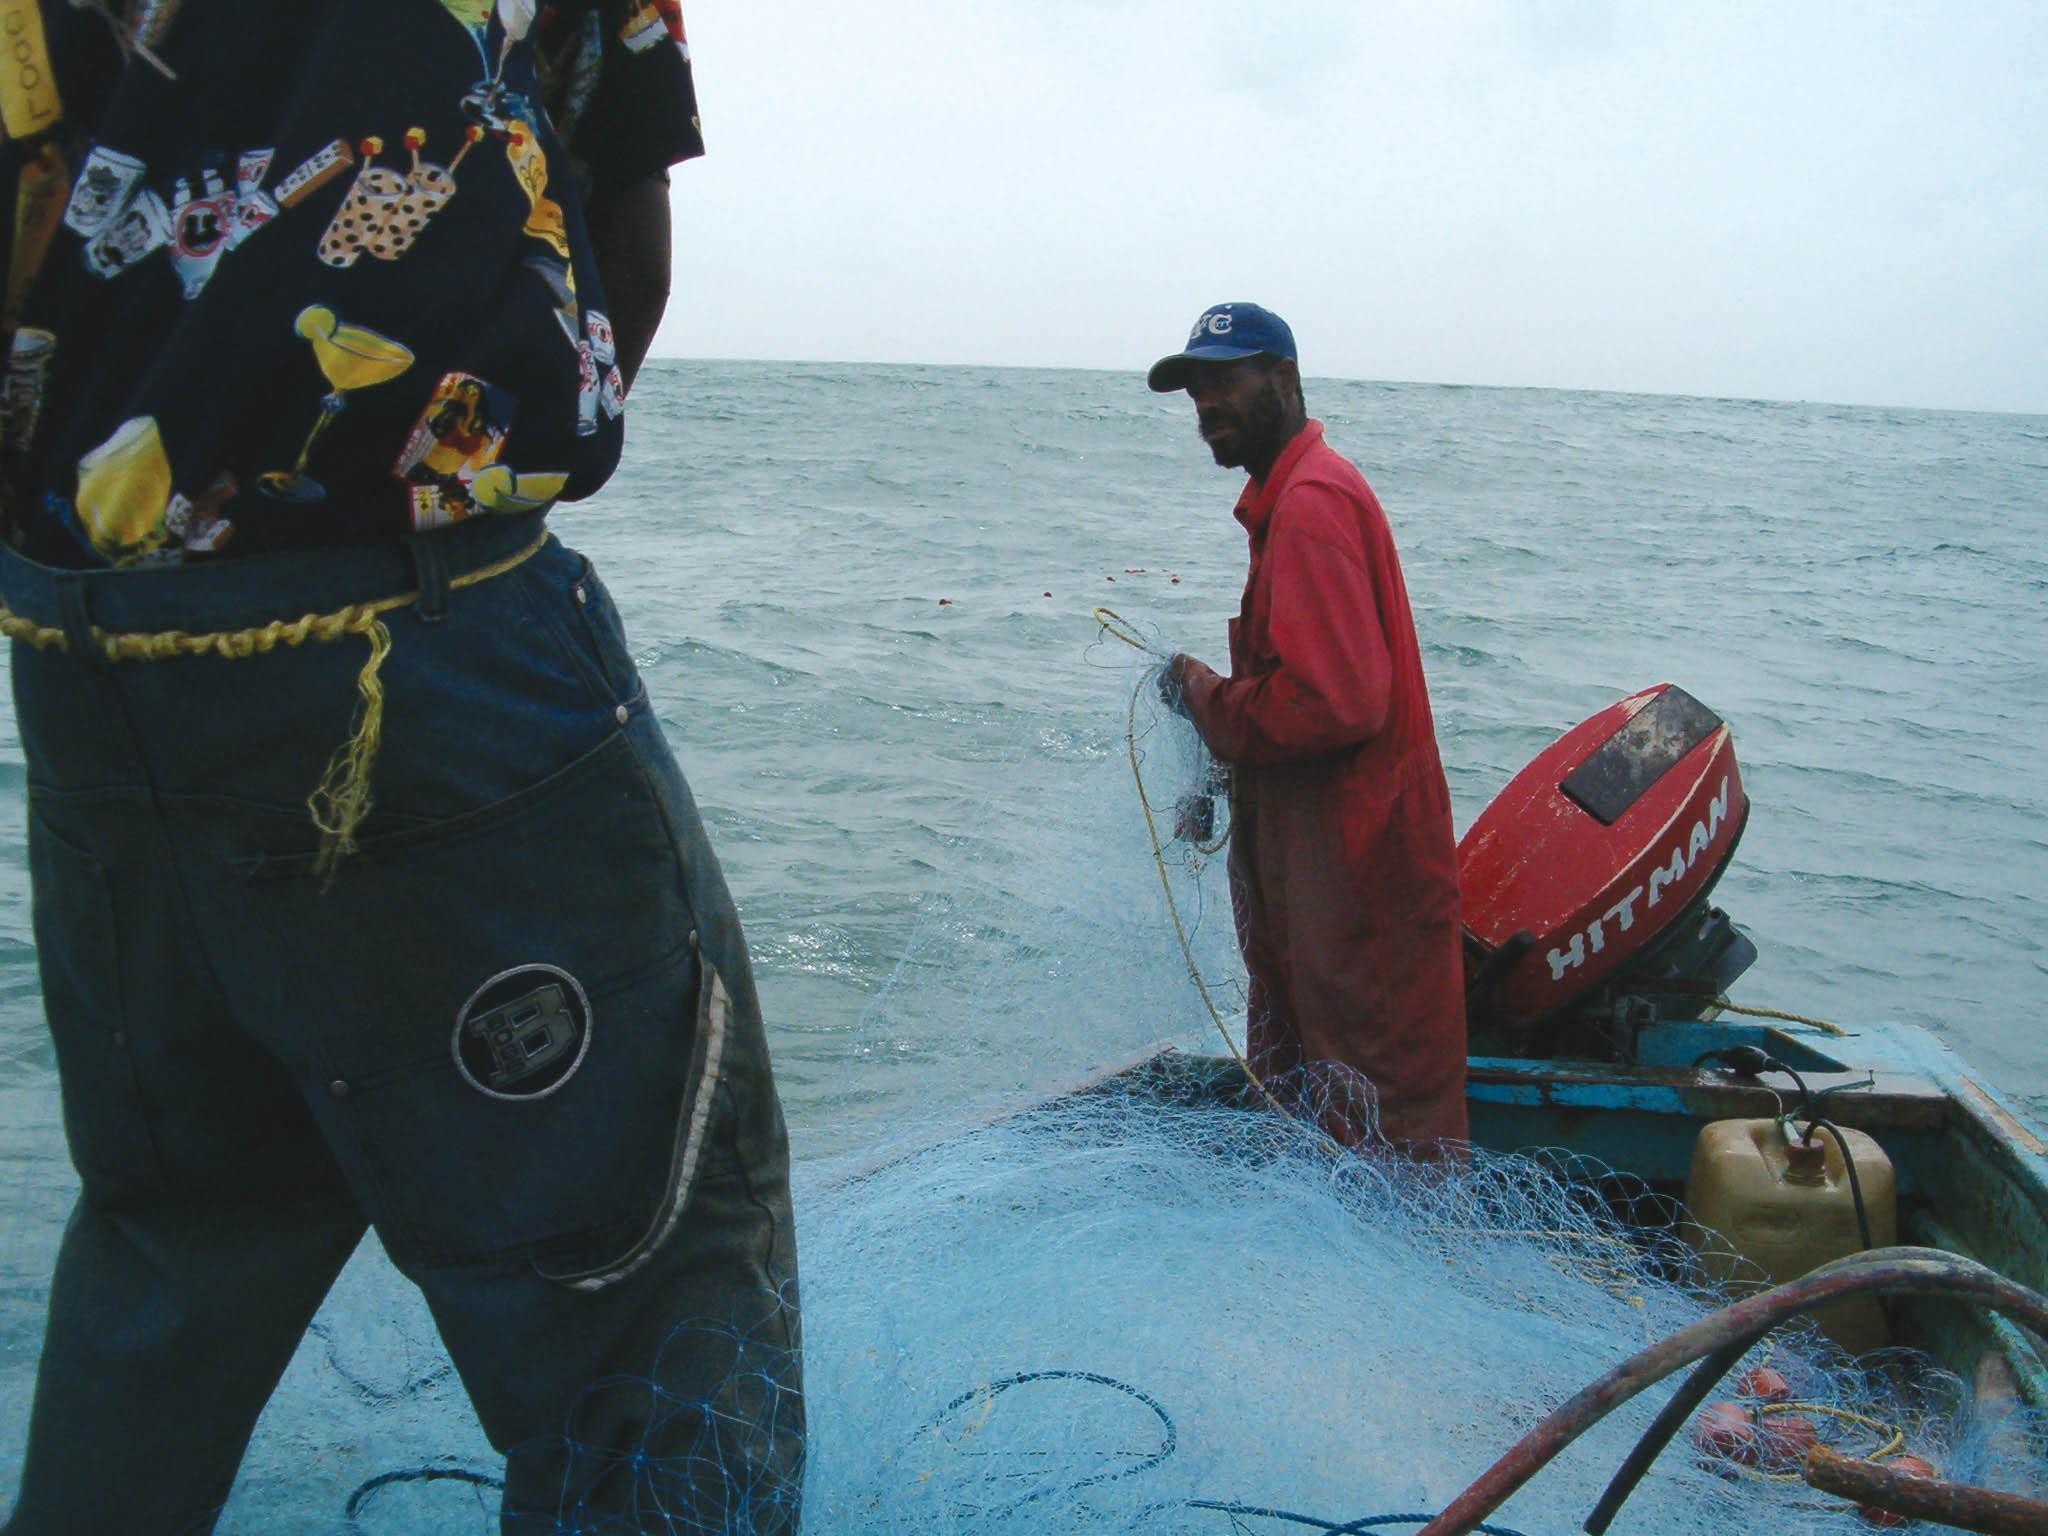 Gillnet fishers in Trinidad and Tobago. © JORDAN GASS, 2005